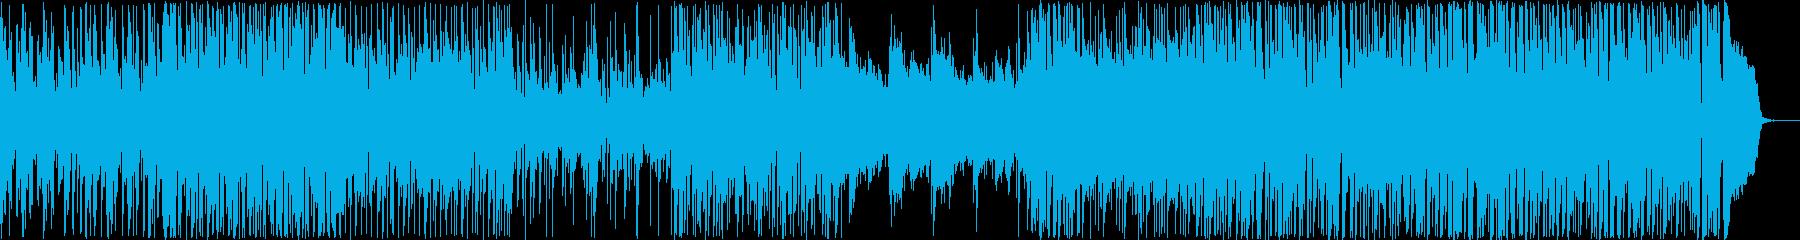 BGM_ライフワークの再生済みの波形